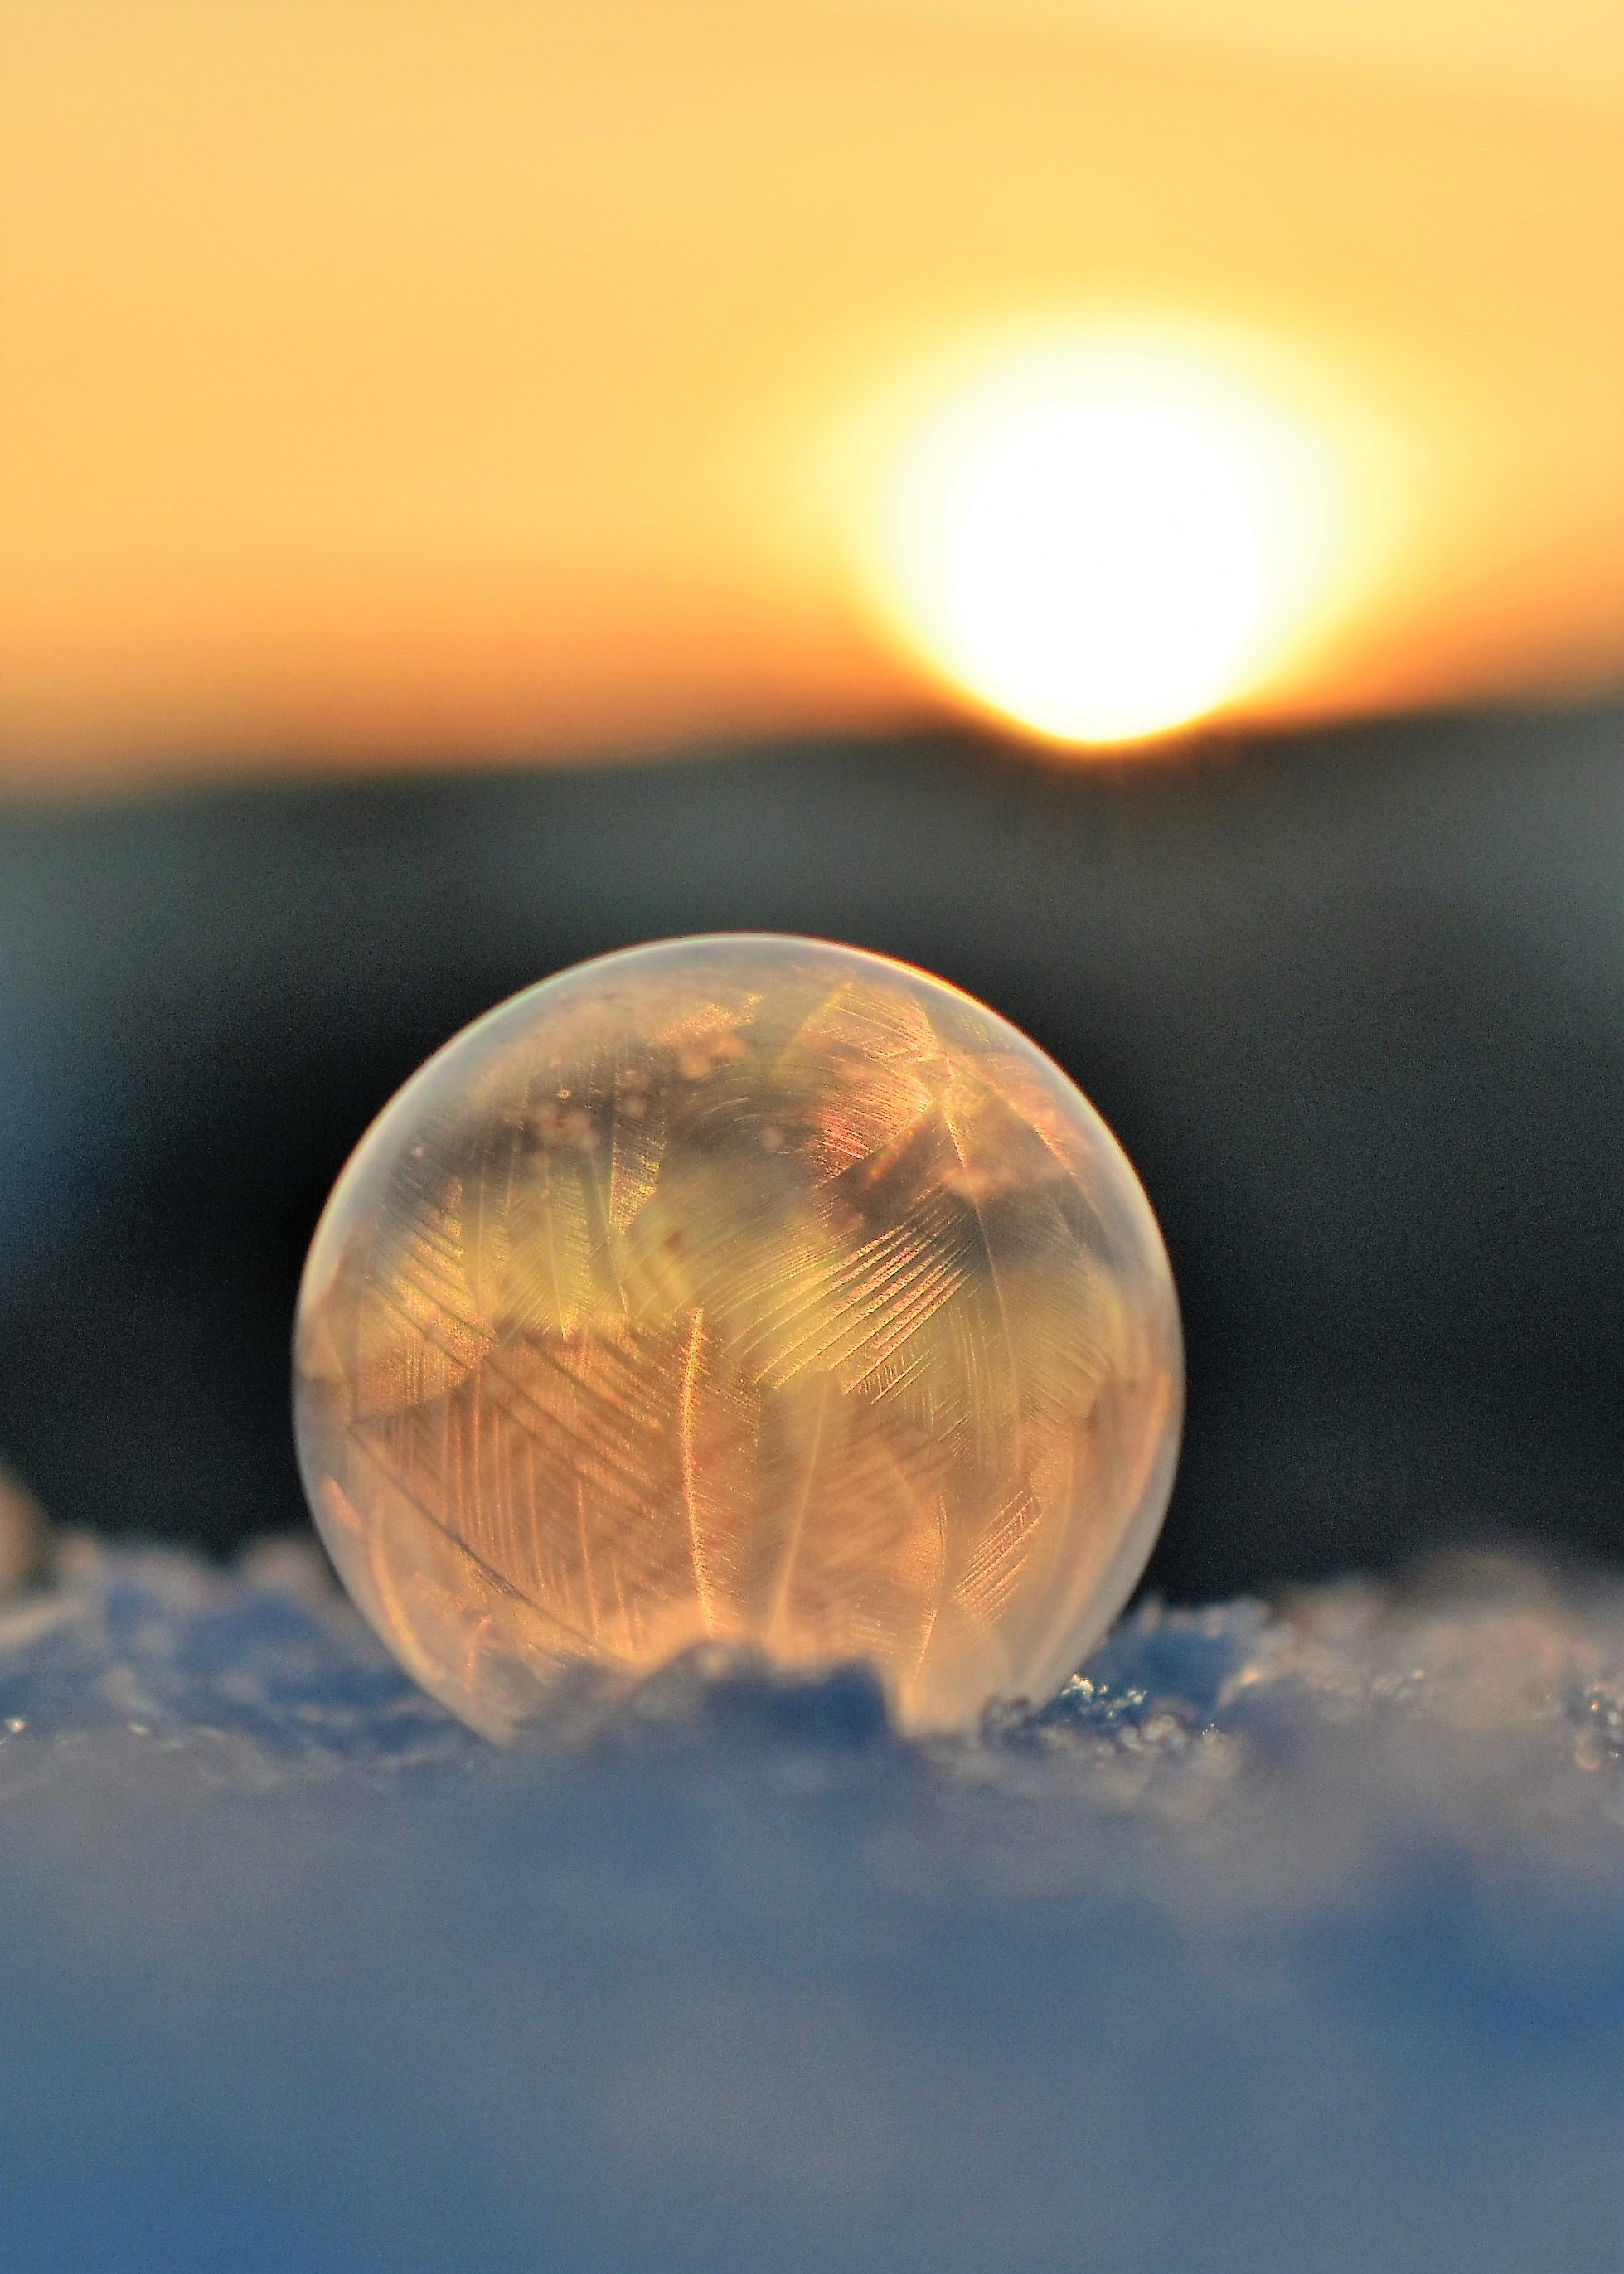 free stock photos of soap bubbles pexels